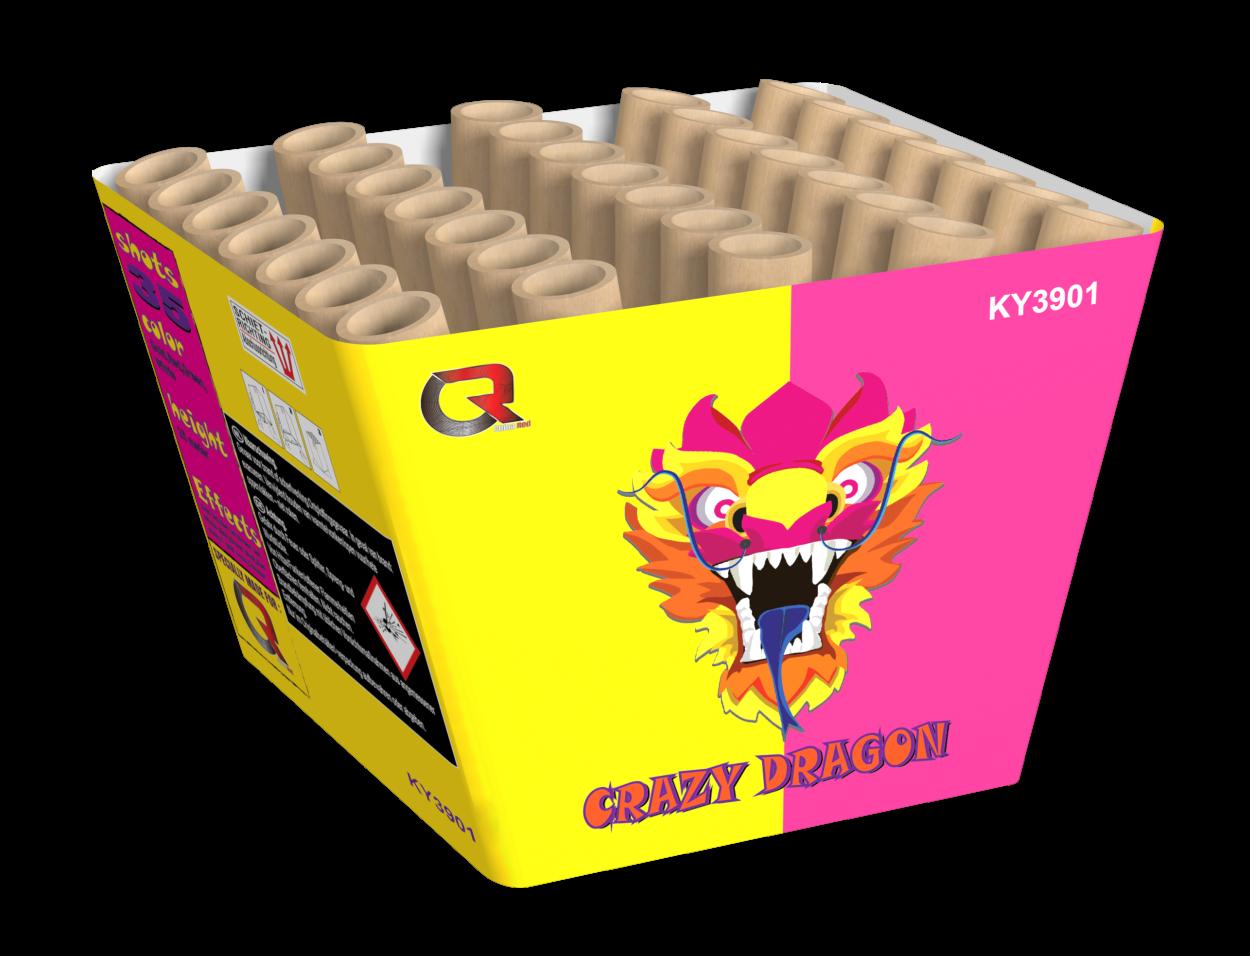 Crazy Dragon*